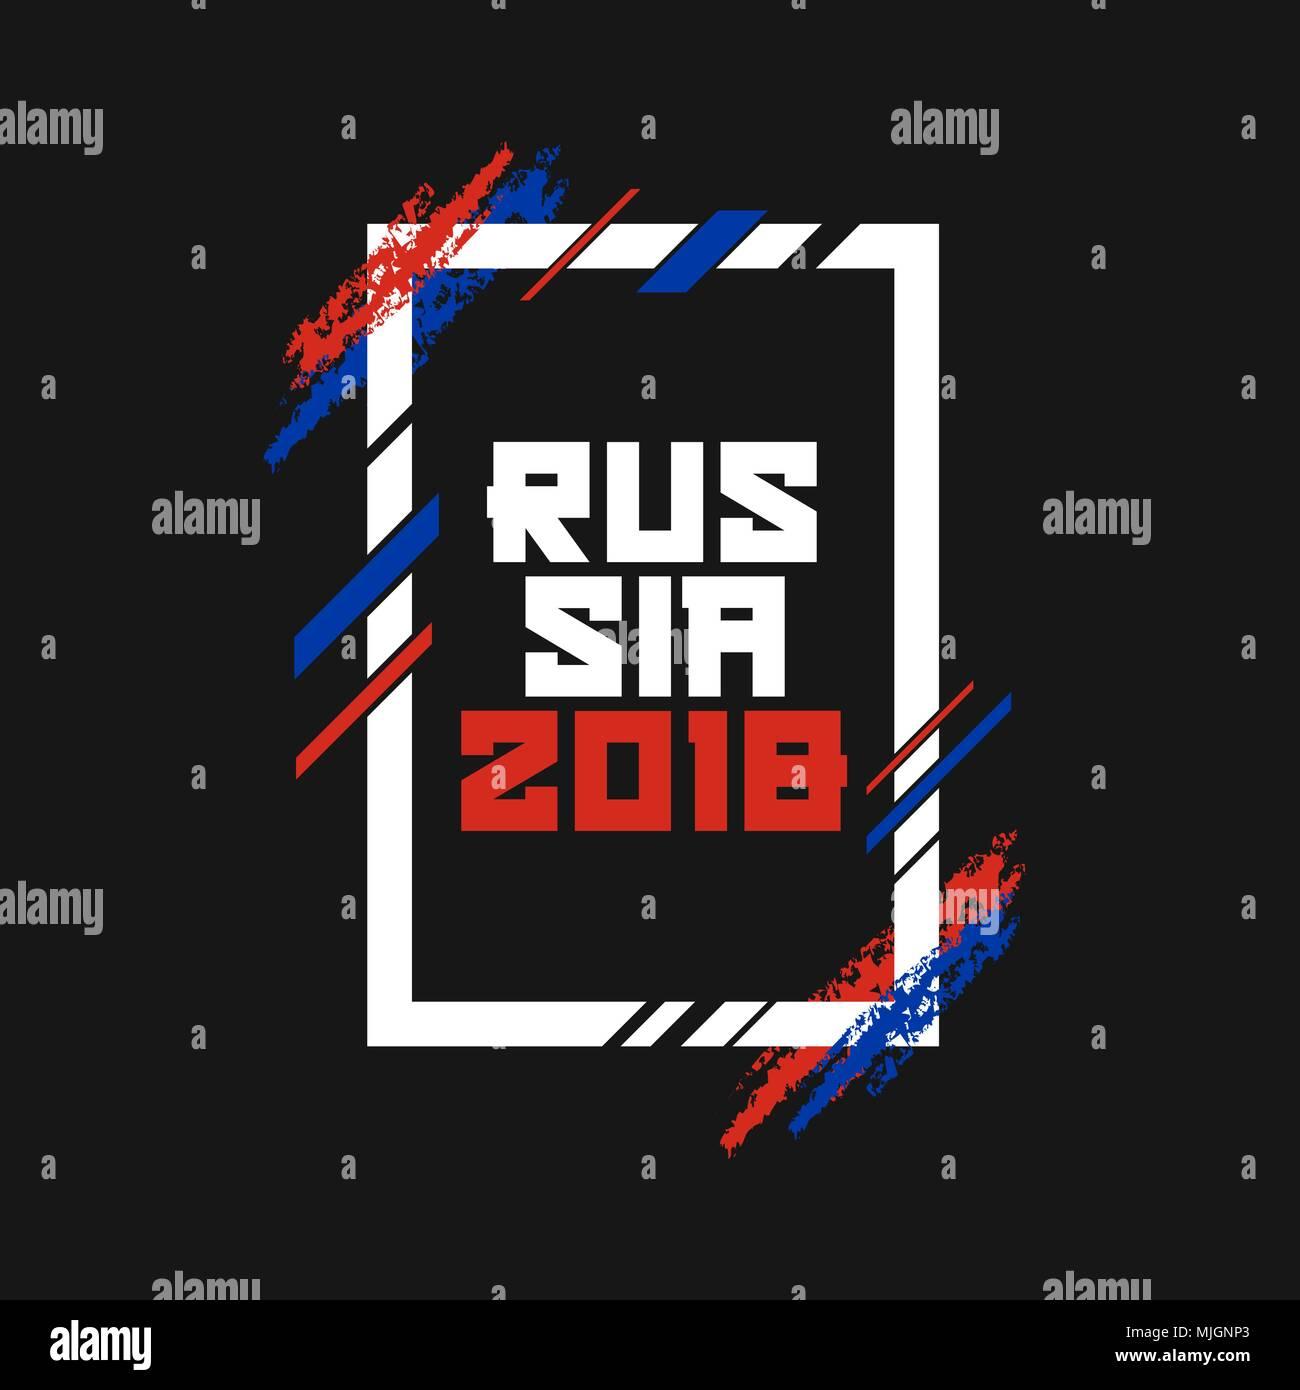 russia 2018 modern art vector frame template for poster banner or